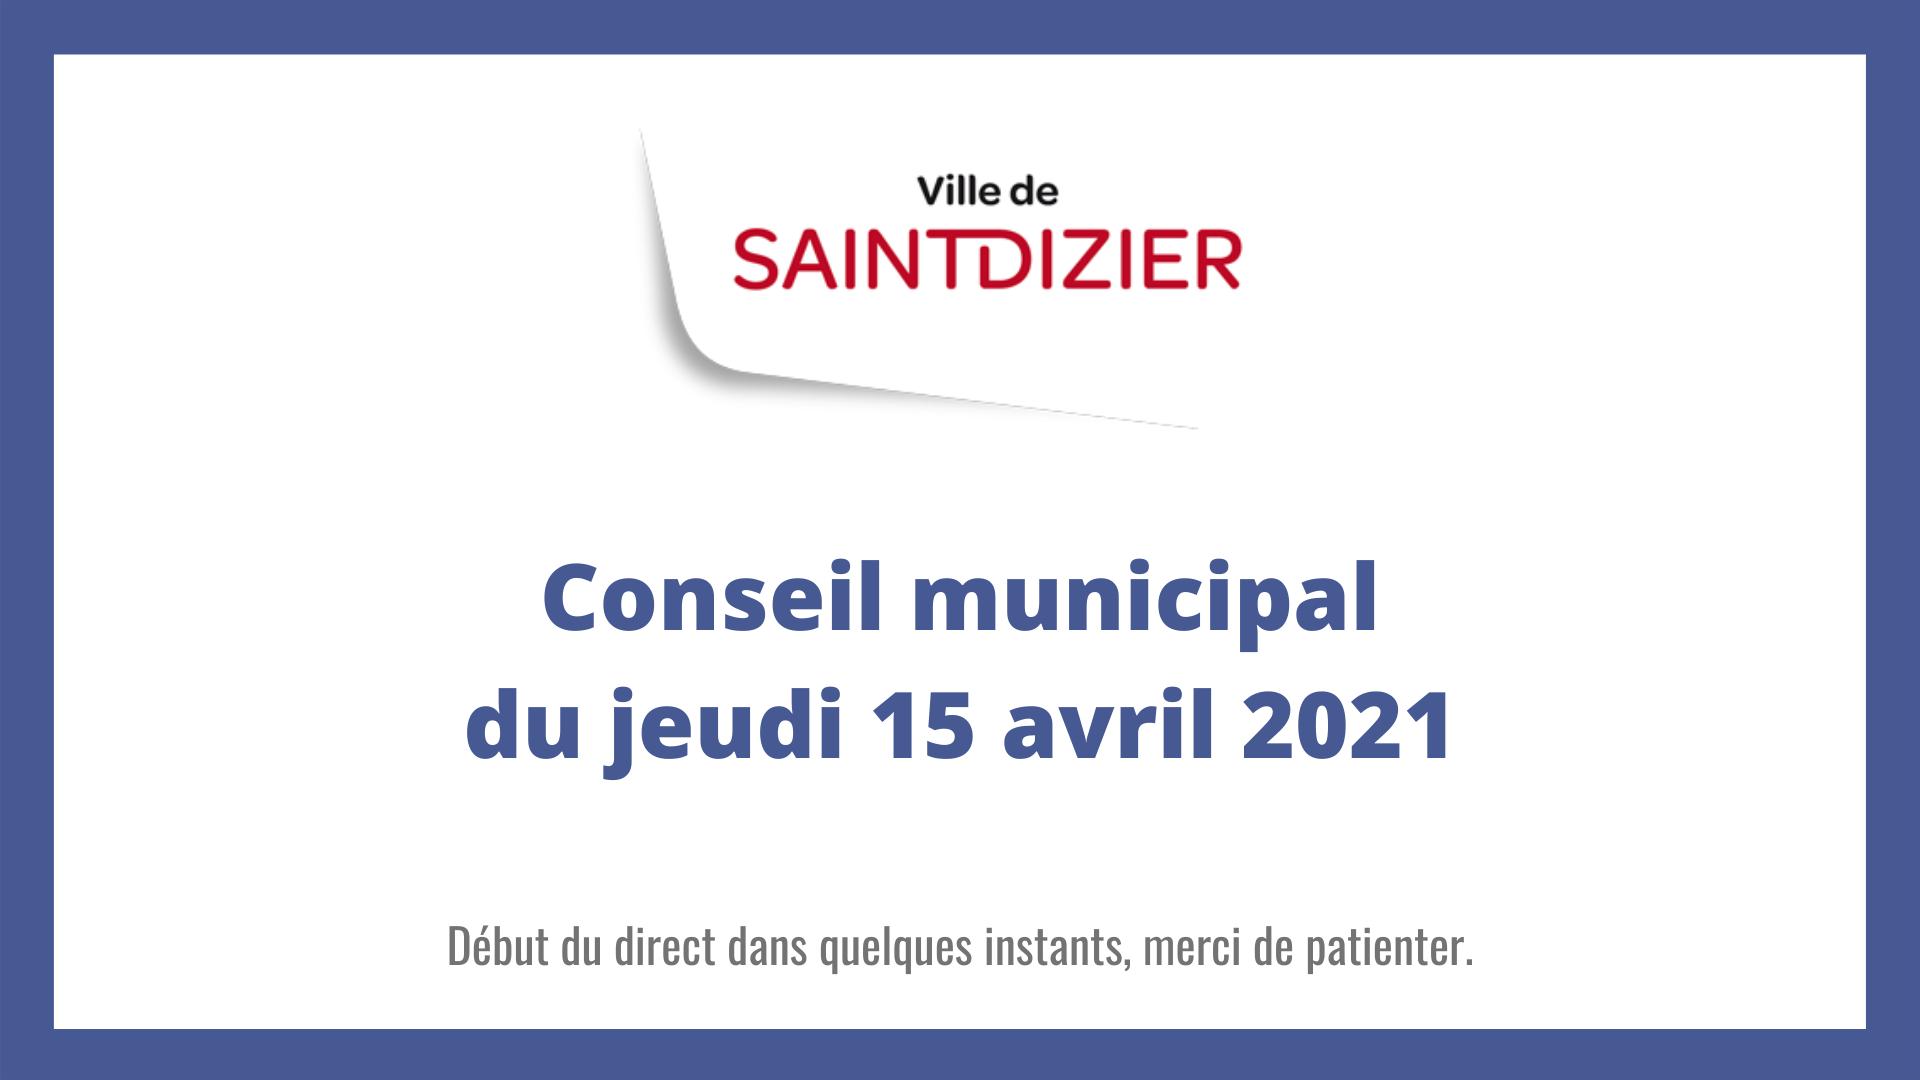 Conseil municipal du jeudi 15 avril 2021